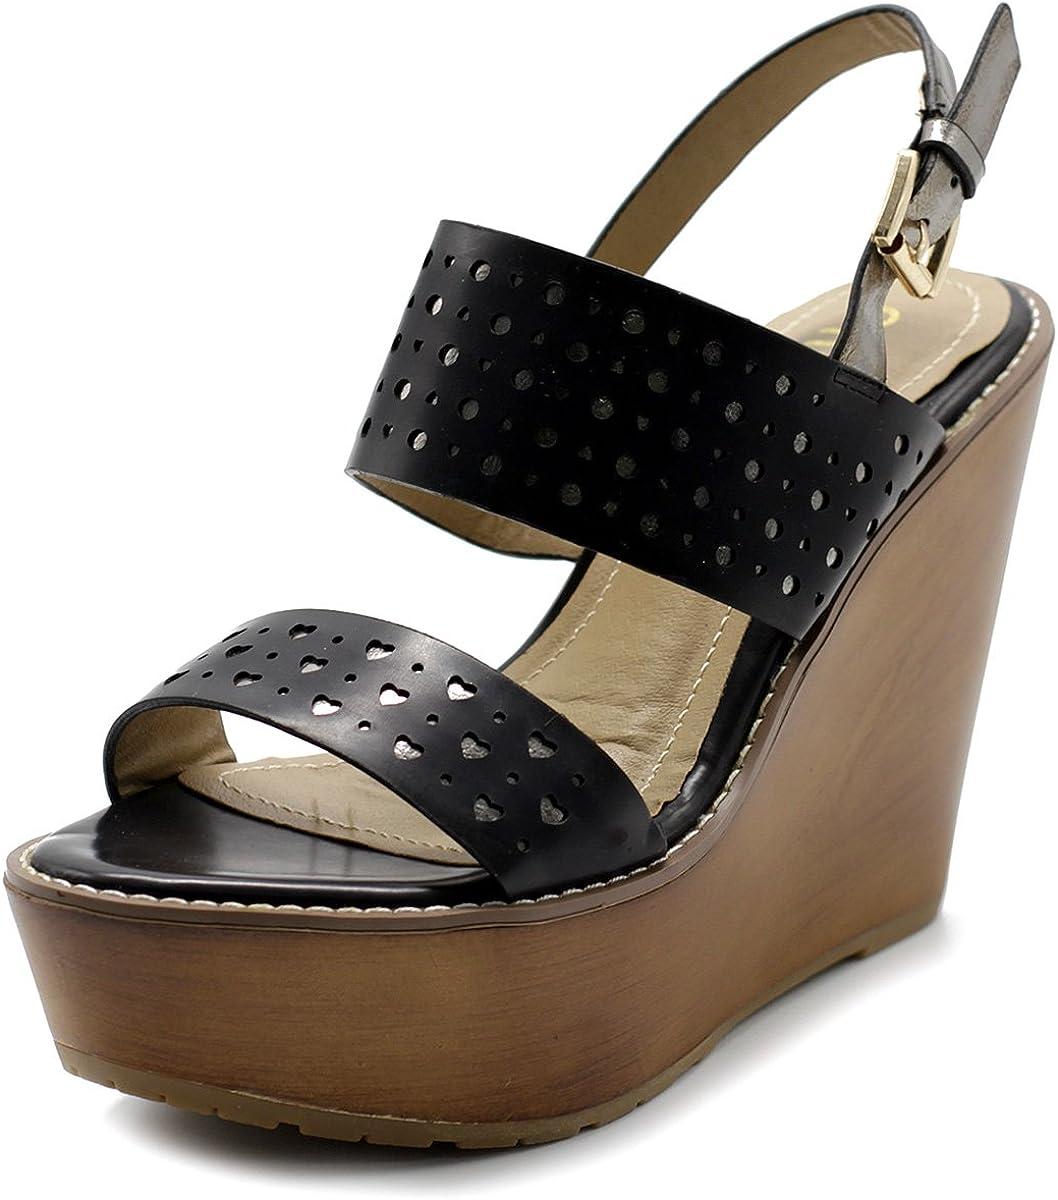 Ollio Phoenix Mall Womens Shoe Metallic Cutout Burnished Sandal Shipping included Wedge Heel